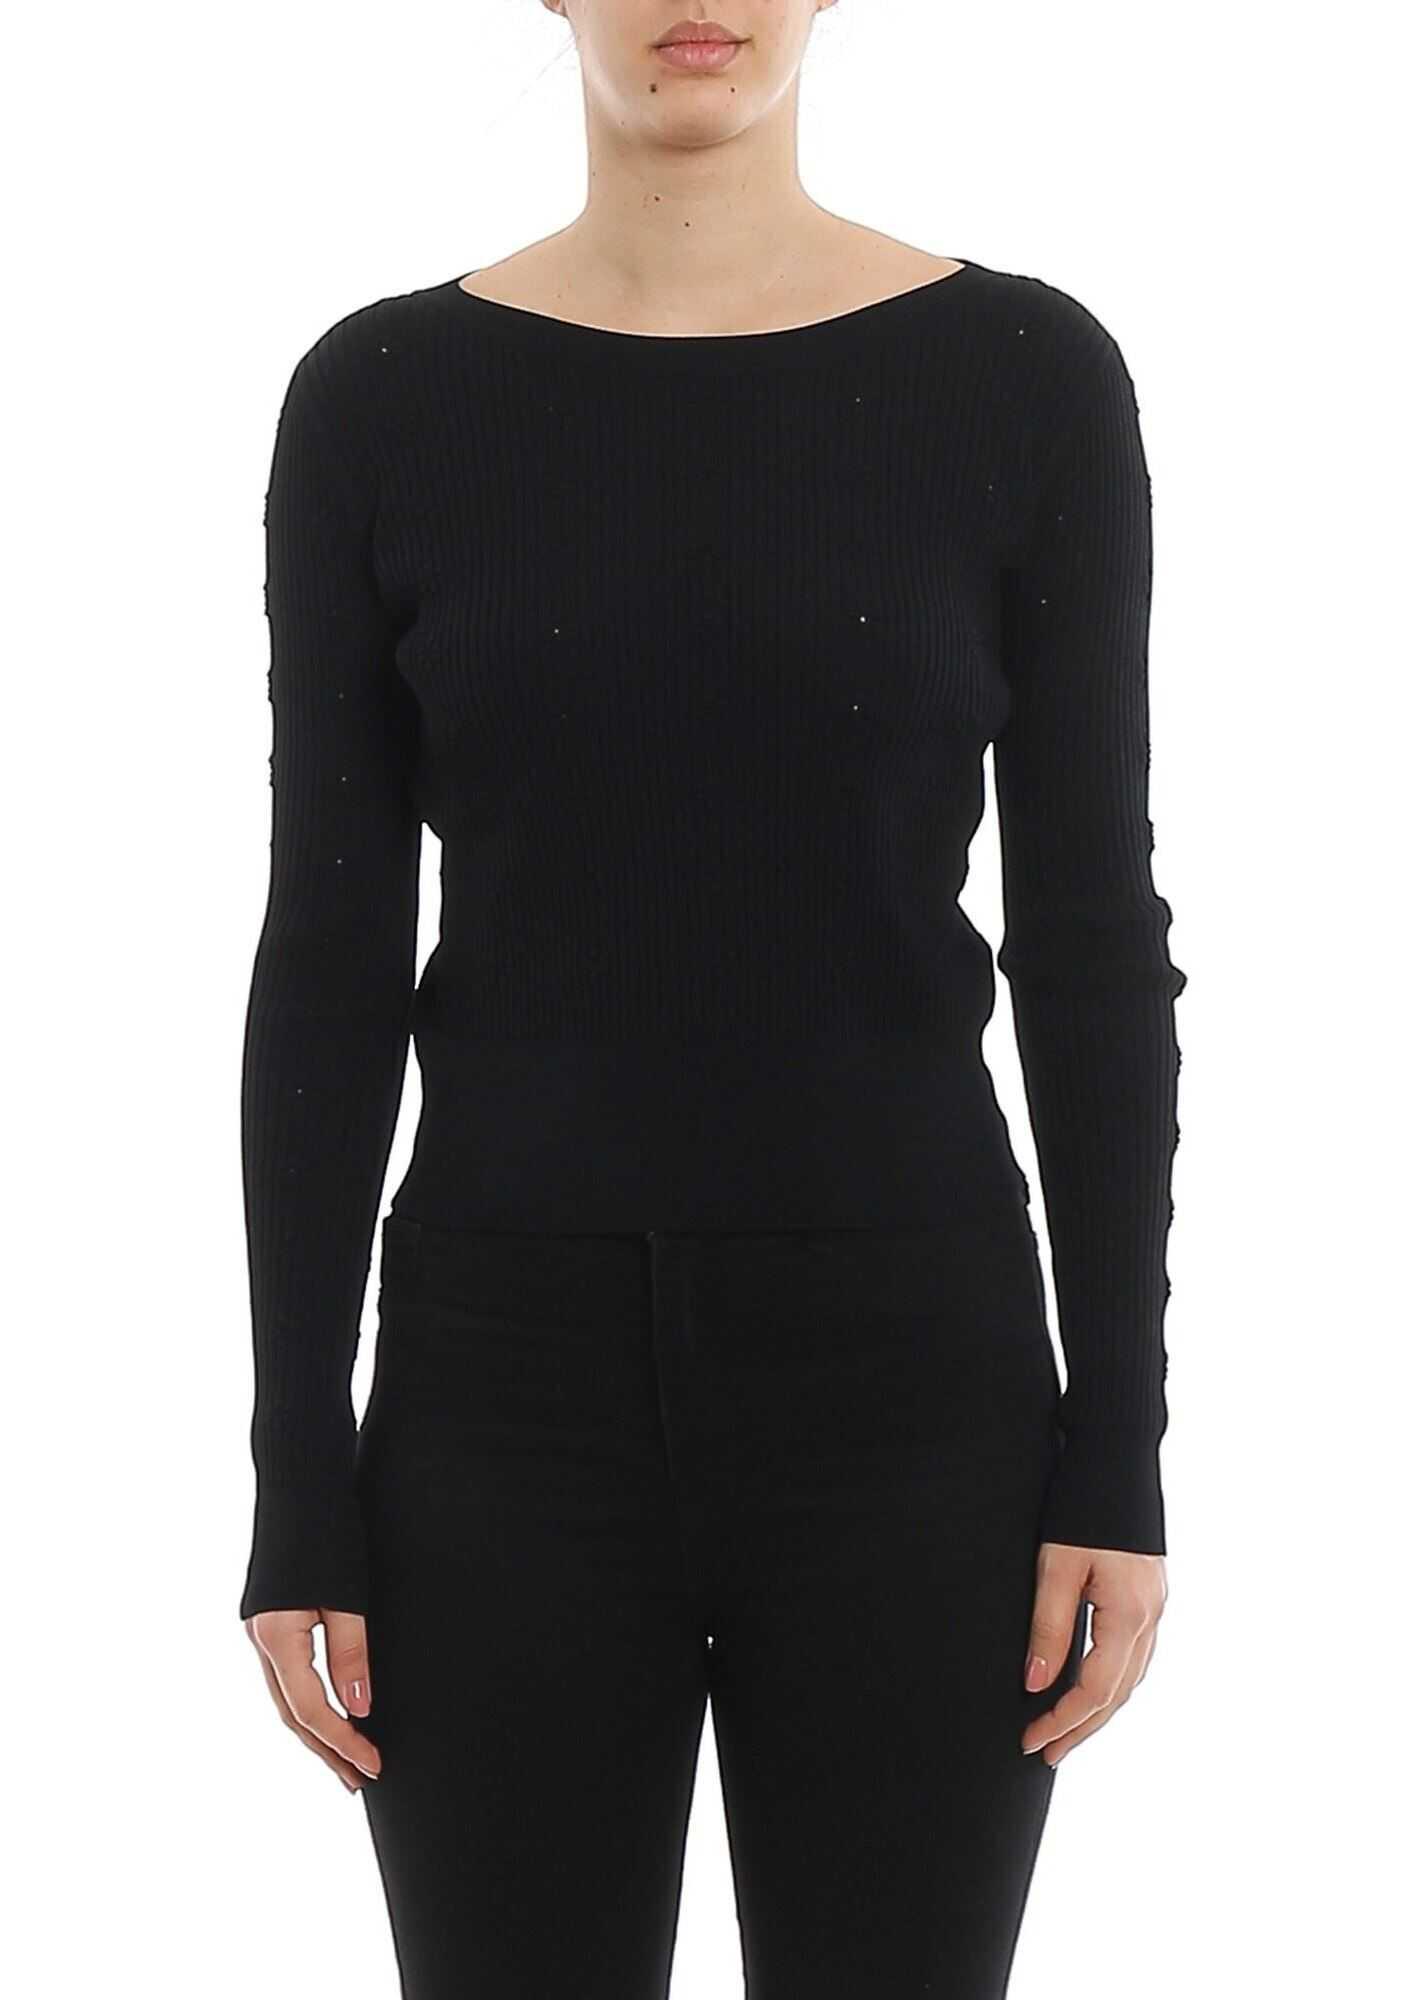 Patrizia Pepe Ribbed Sweater With Rhinestones In Black Black